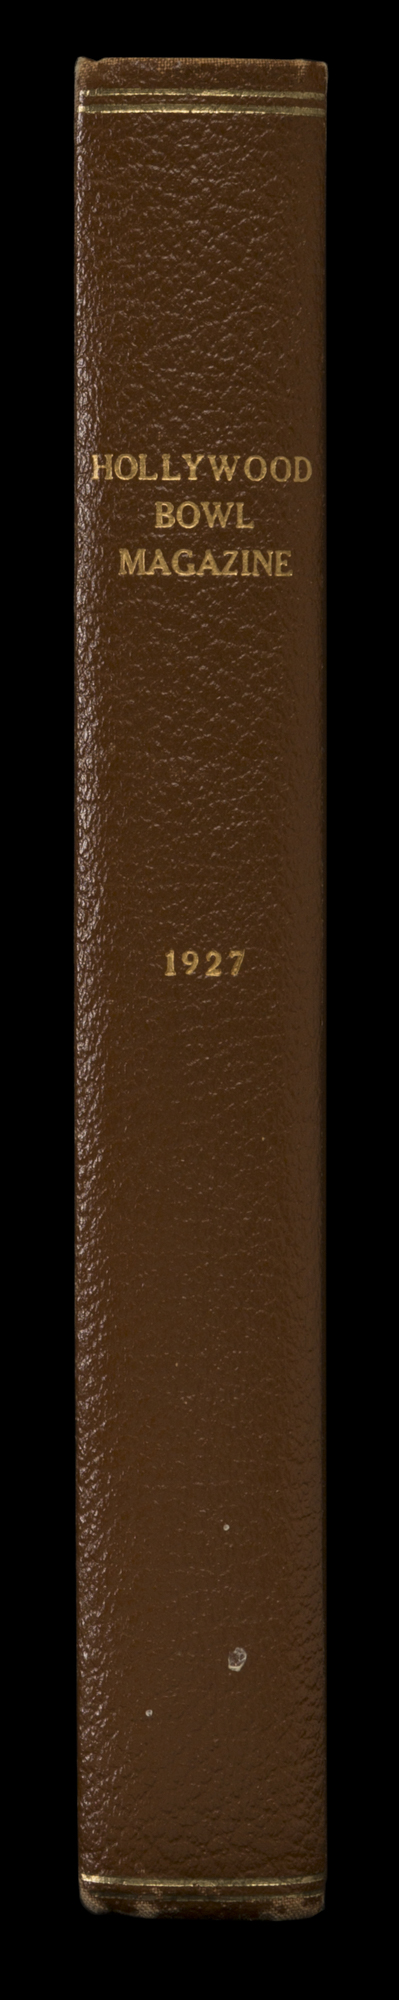 HB_ProgramBook_Spine_1927.jpg